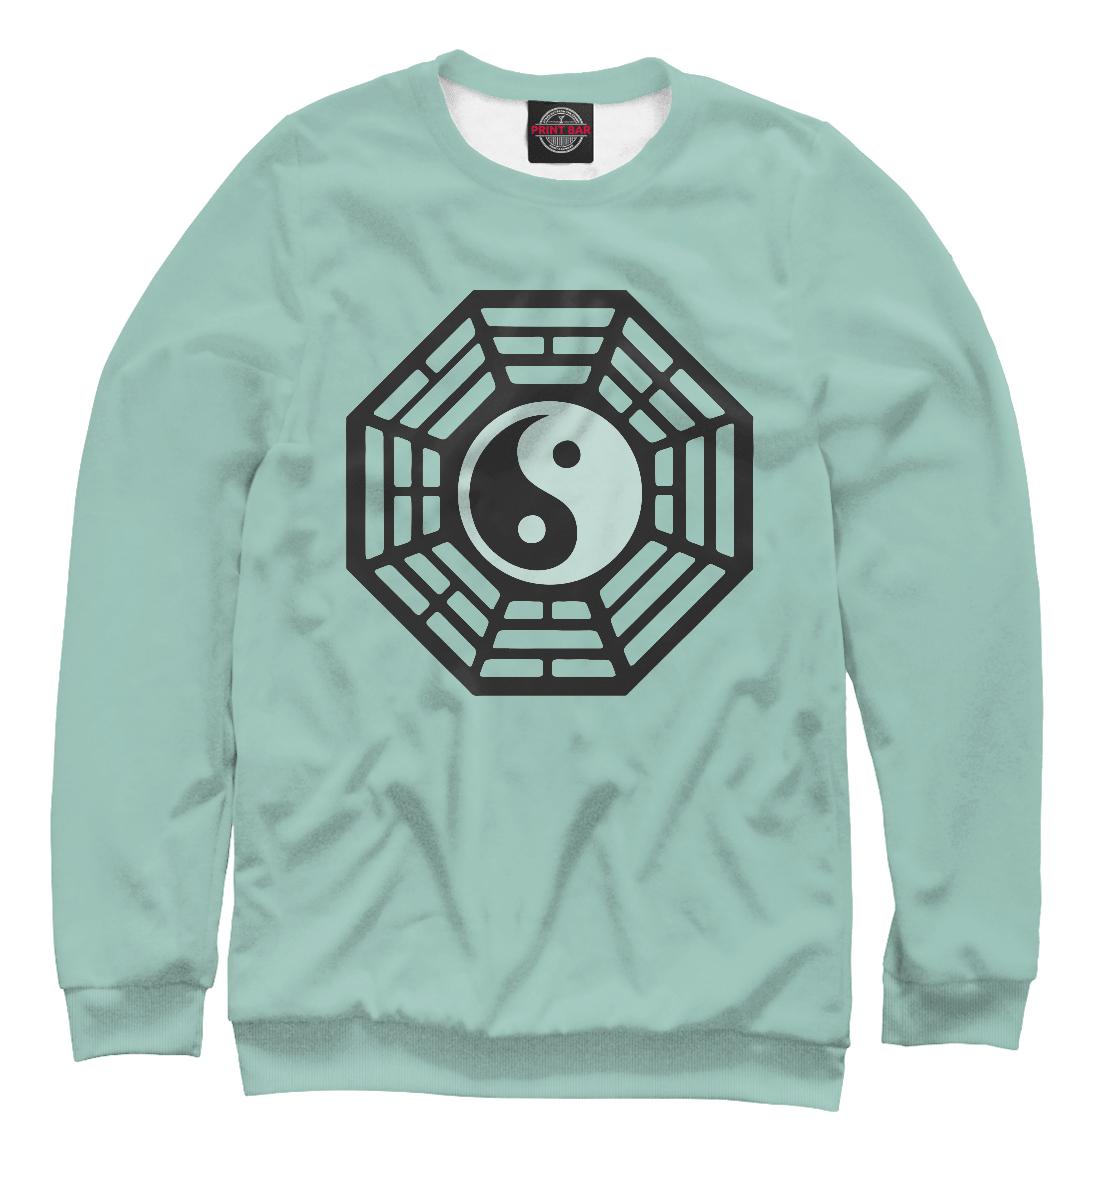 Купить Lost - Dharma Initiative (Blue), Printbar, Свитшоты, APD-420461-swi-1